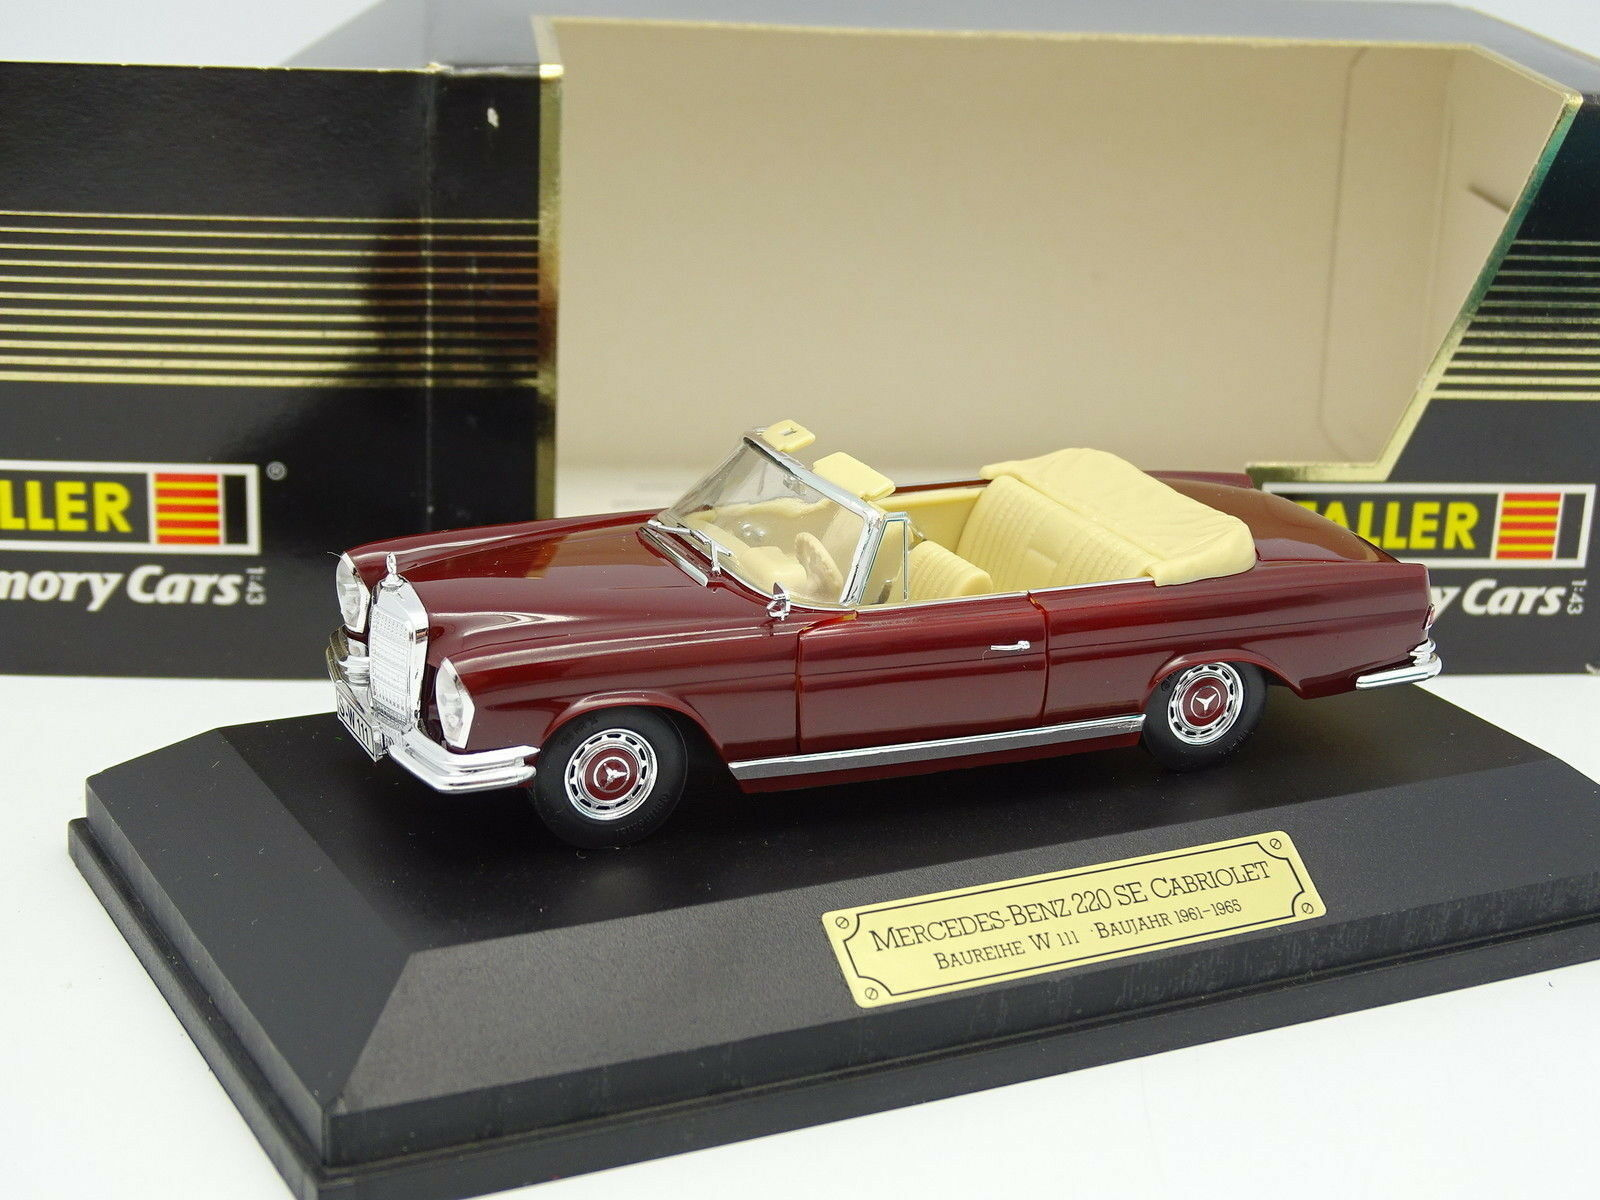 FALLER 1 43 - MERCEDES 220 sich Cabriolet Rot W111 1961